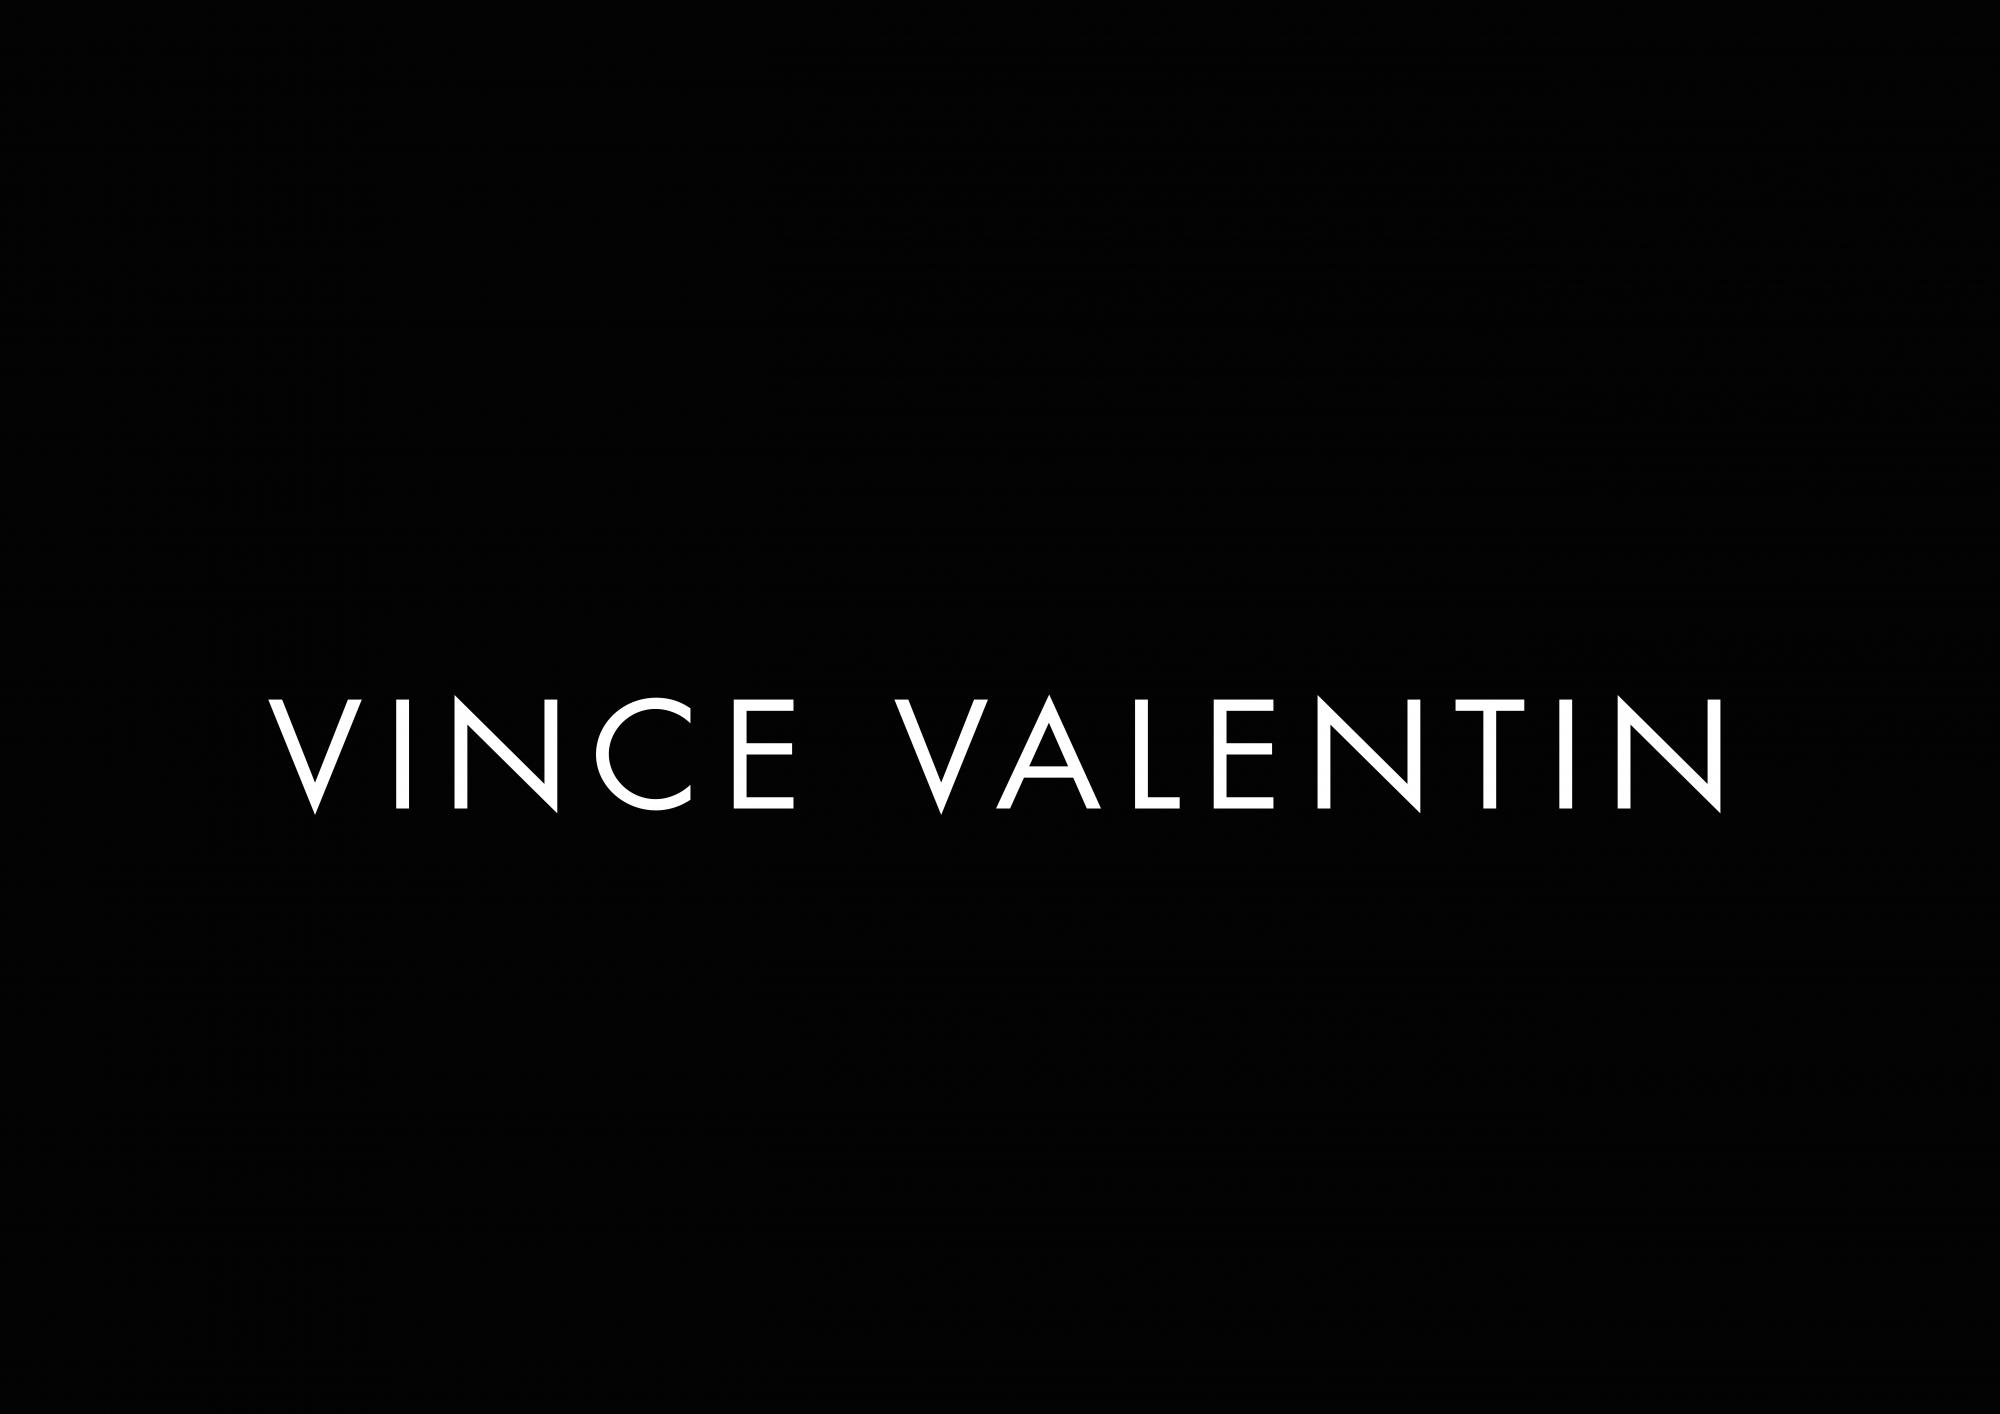 Vince Valentin